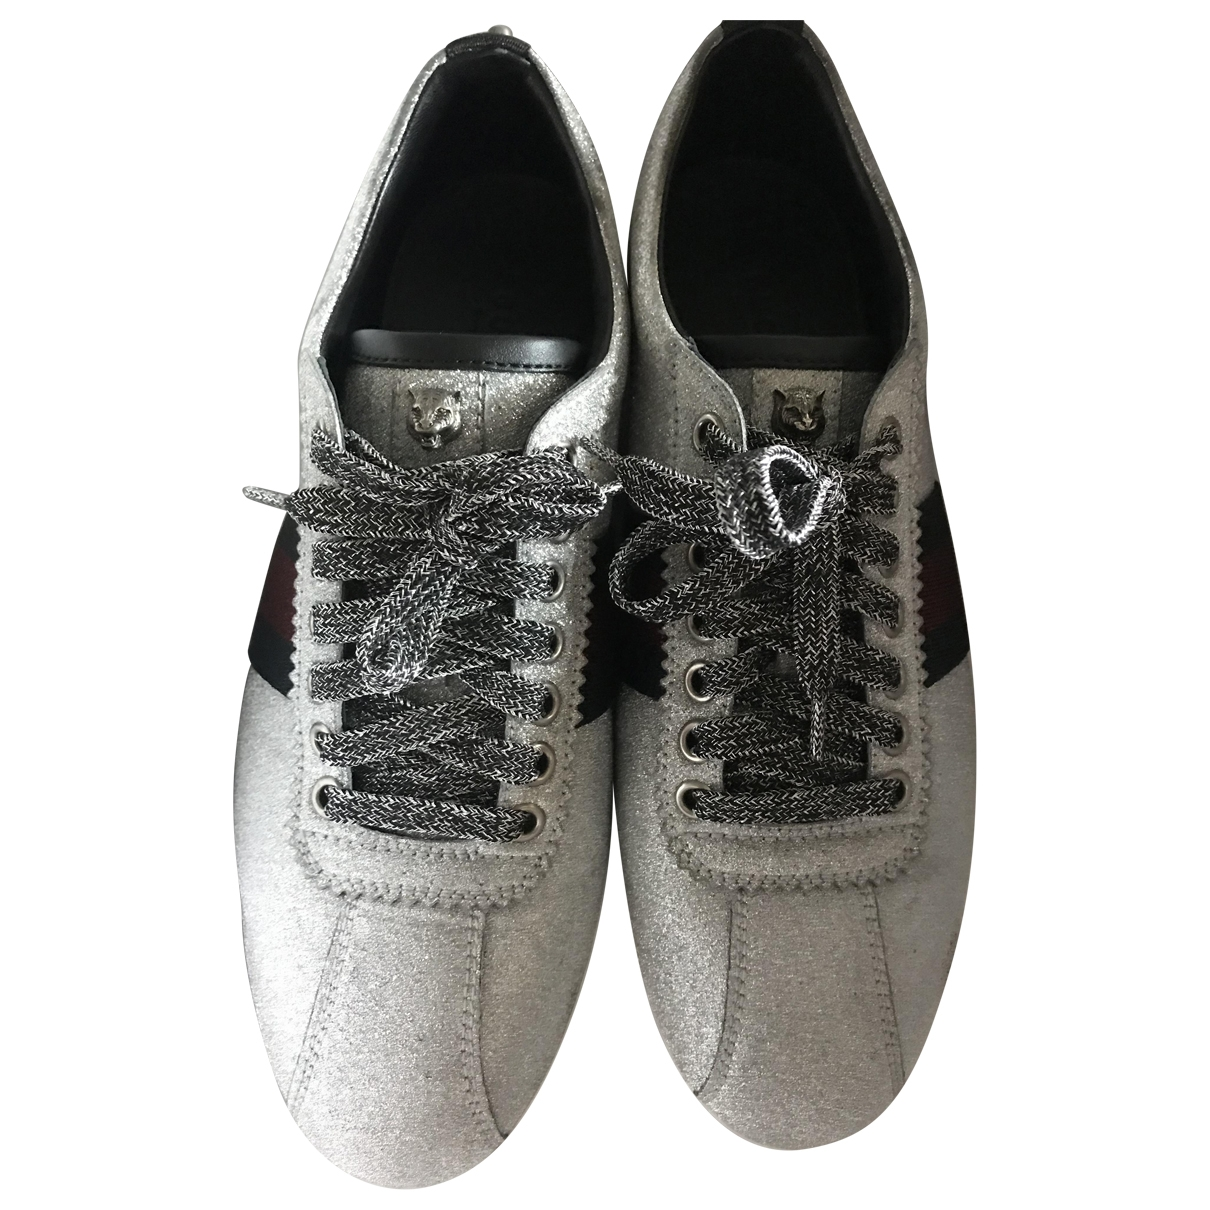 Gucci Ace Grey Glitter Trainers for Women 38 EU